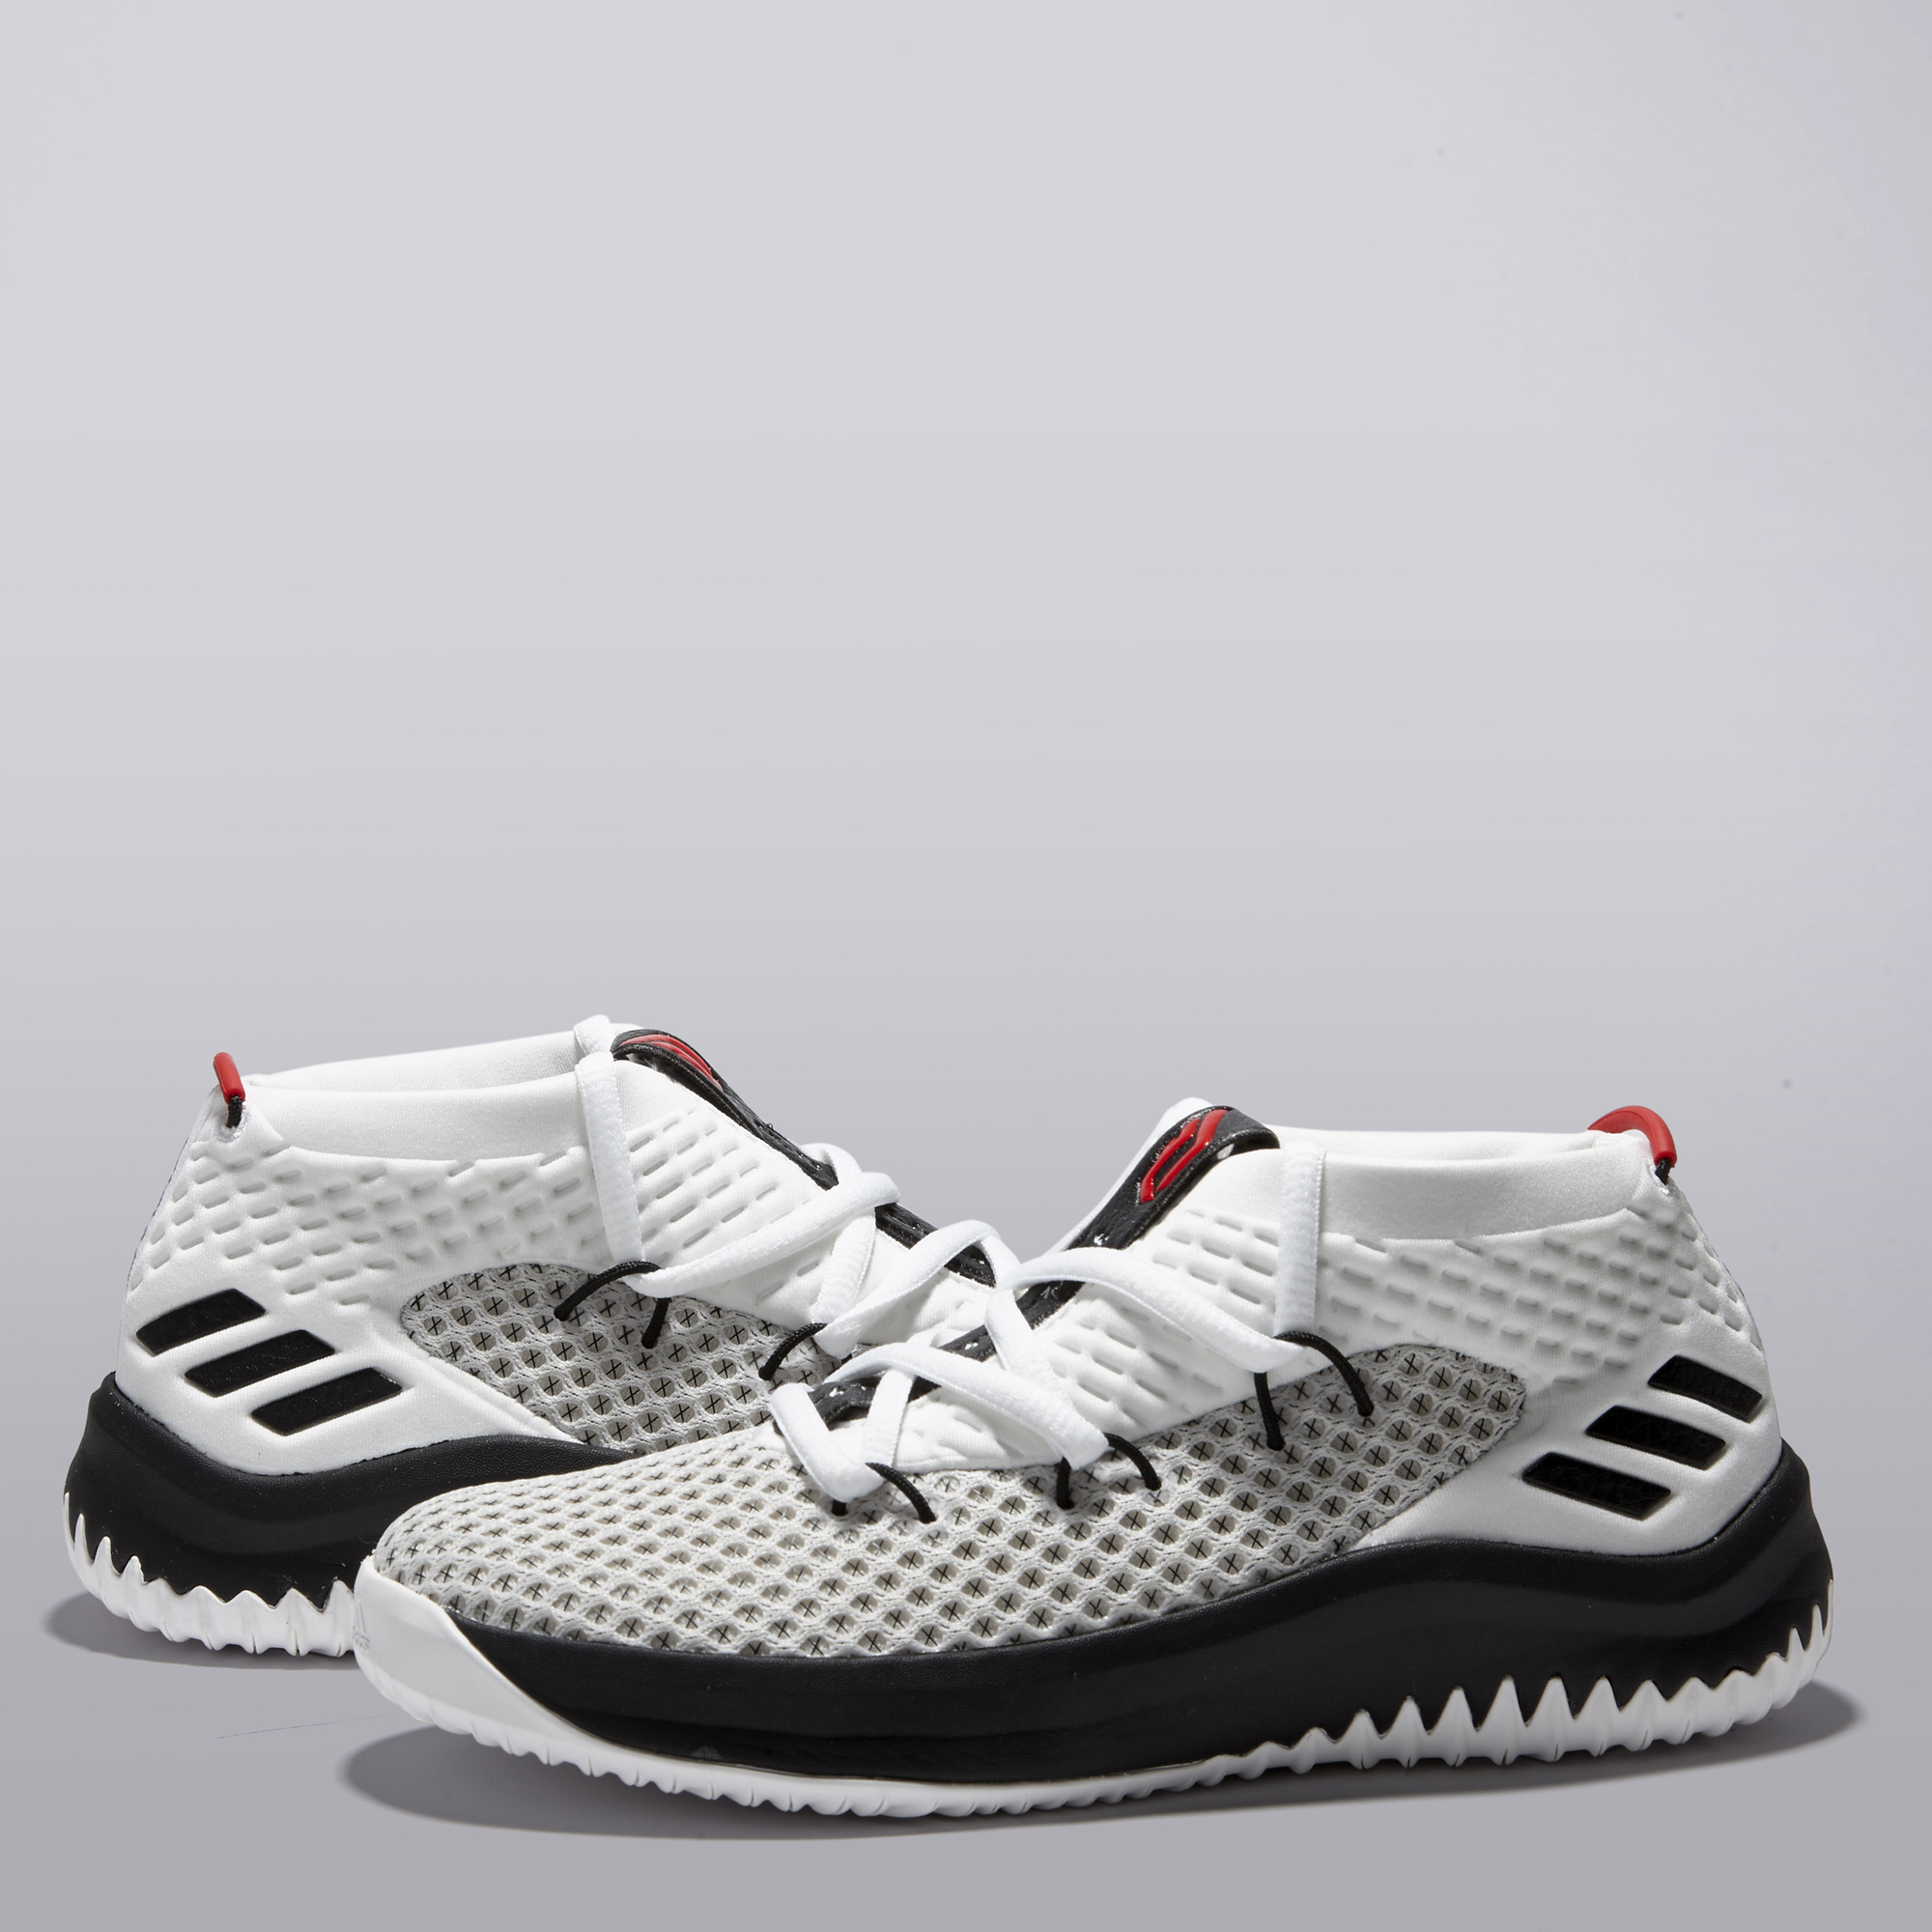 "Image of ""adidas Lillard 3 Basketball Shoe - Home - Kids"""